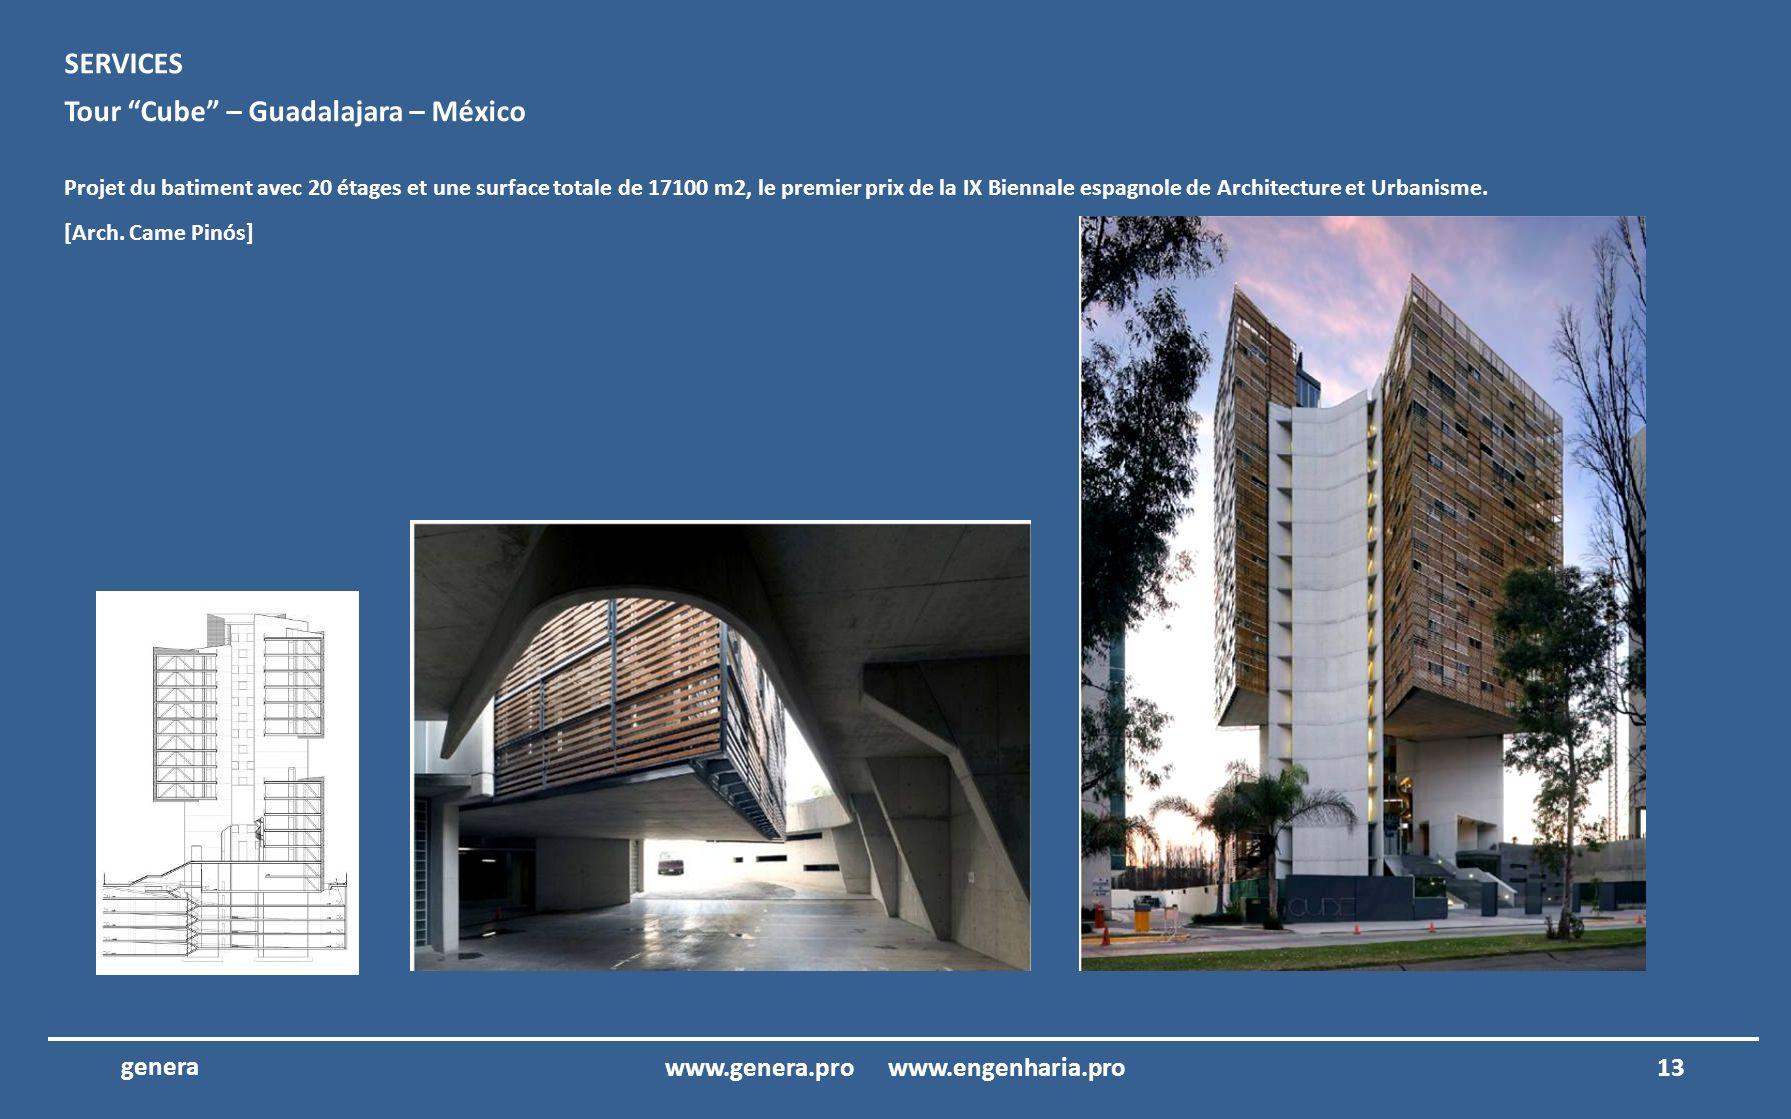 12www.genera.pro www.engenharia.pro genera Édifice TIM - Rio de Janeiro – Brésil Projet executif du Batiment TIM à Rio de Janeiro, Brésil.